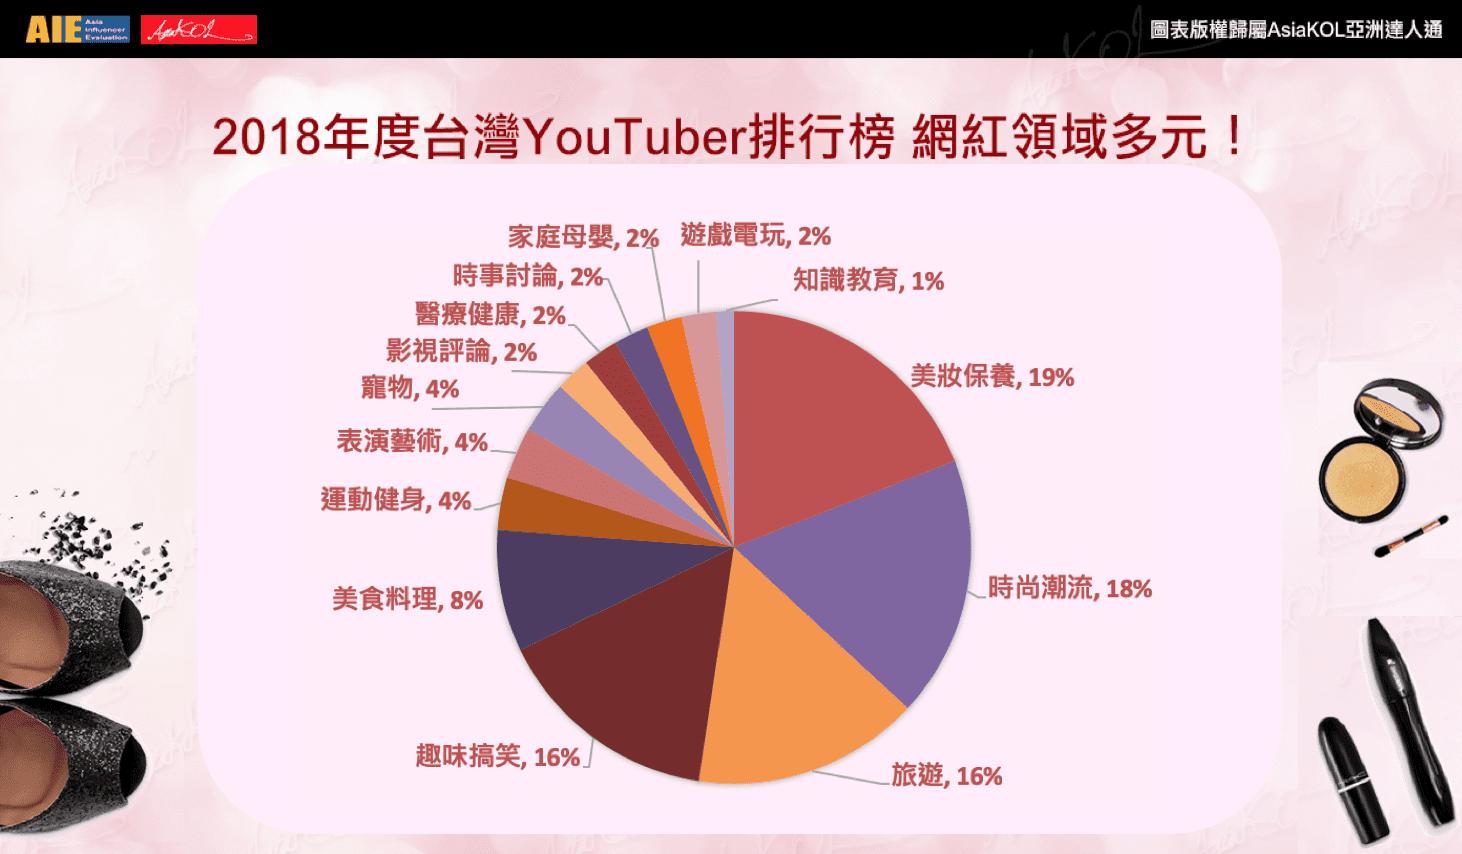 AsiaKOL帶你見識社群影響力 快看2018年度台灣YouTuber排行榜!